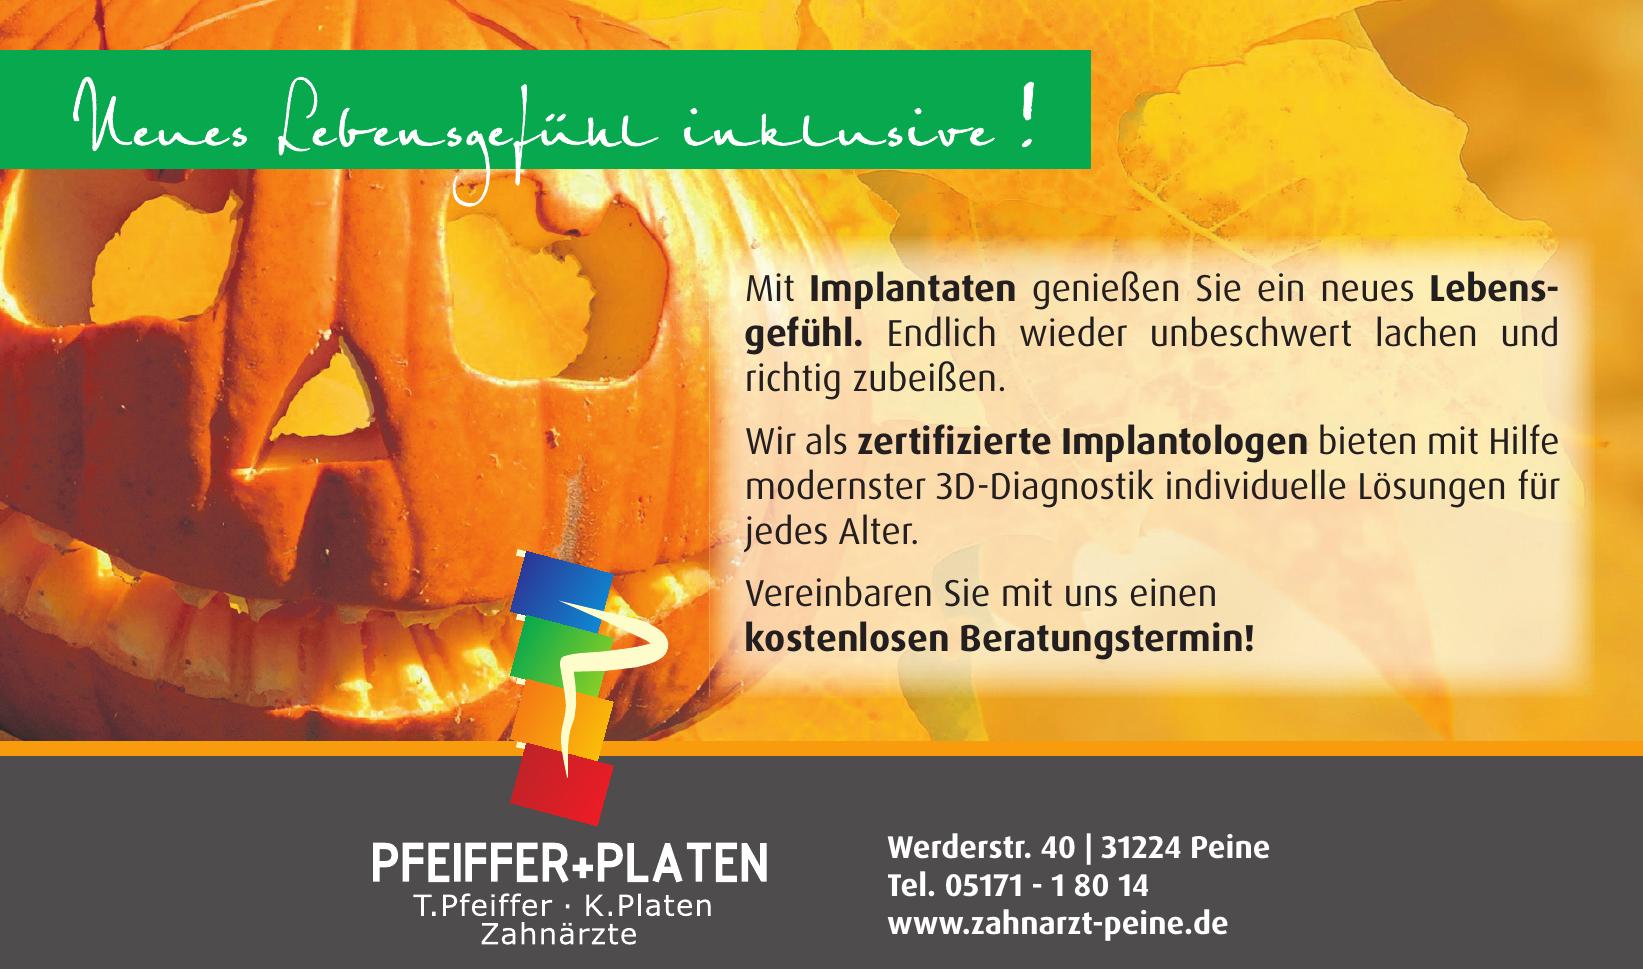 Pfeifer+Platen